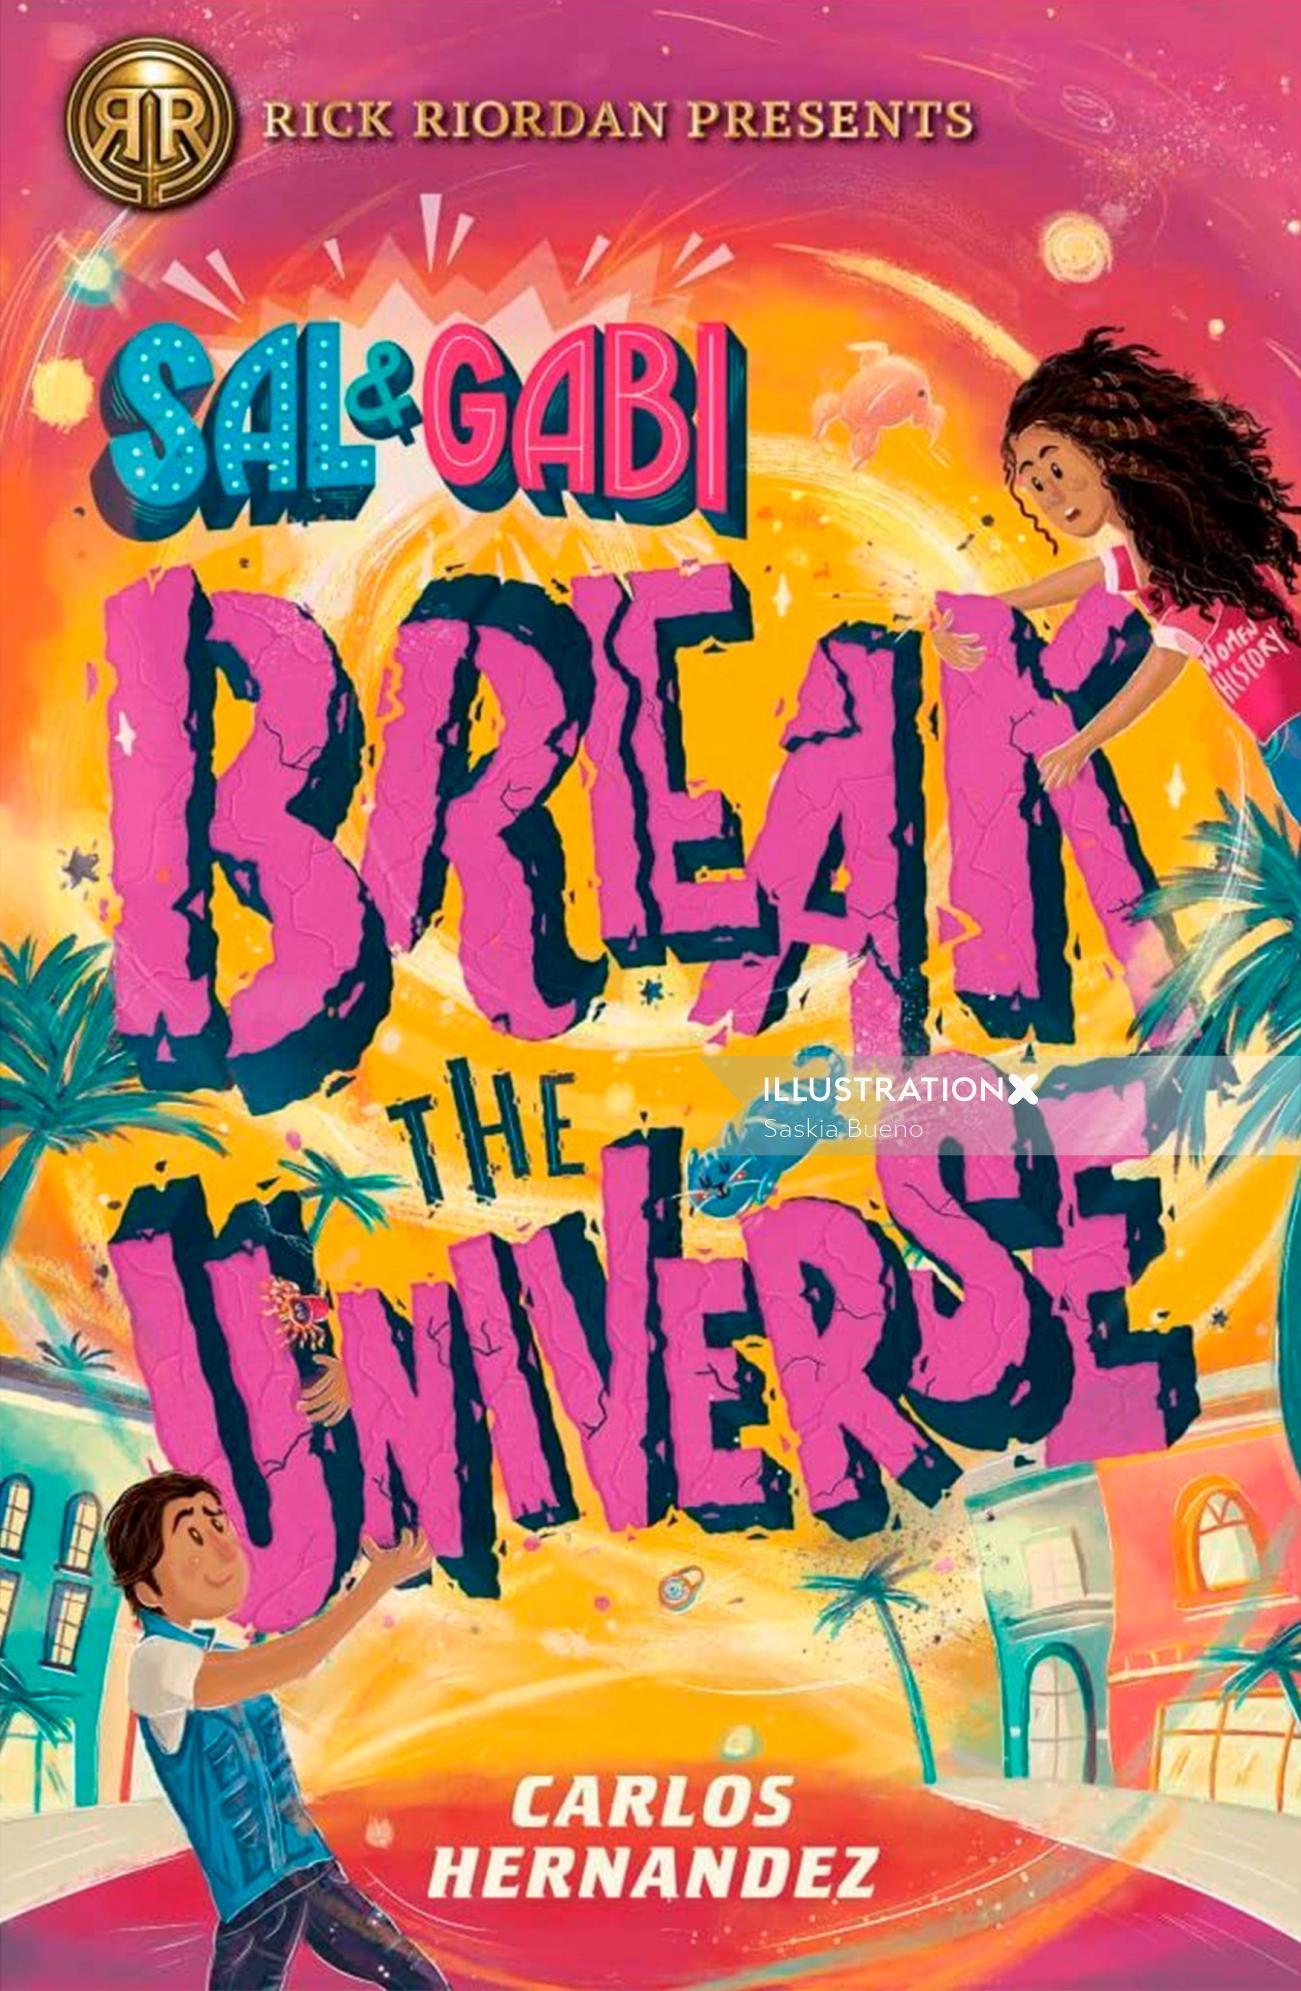 Lettering illustration of Sal & Gabi Break the Universe